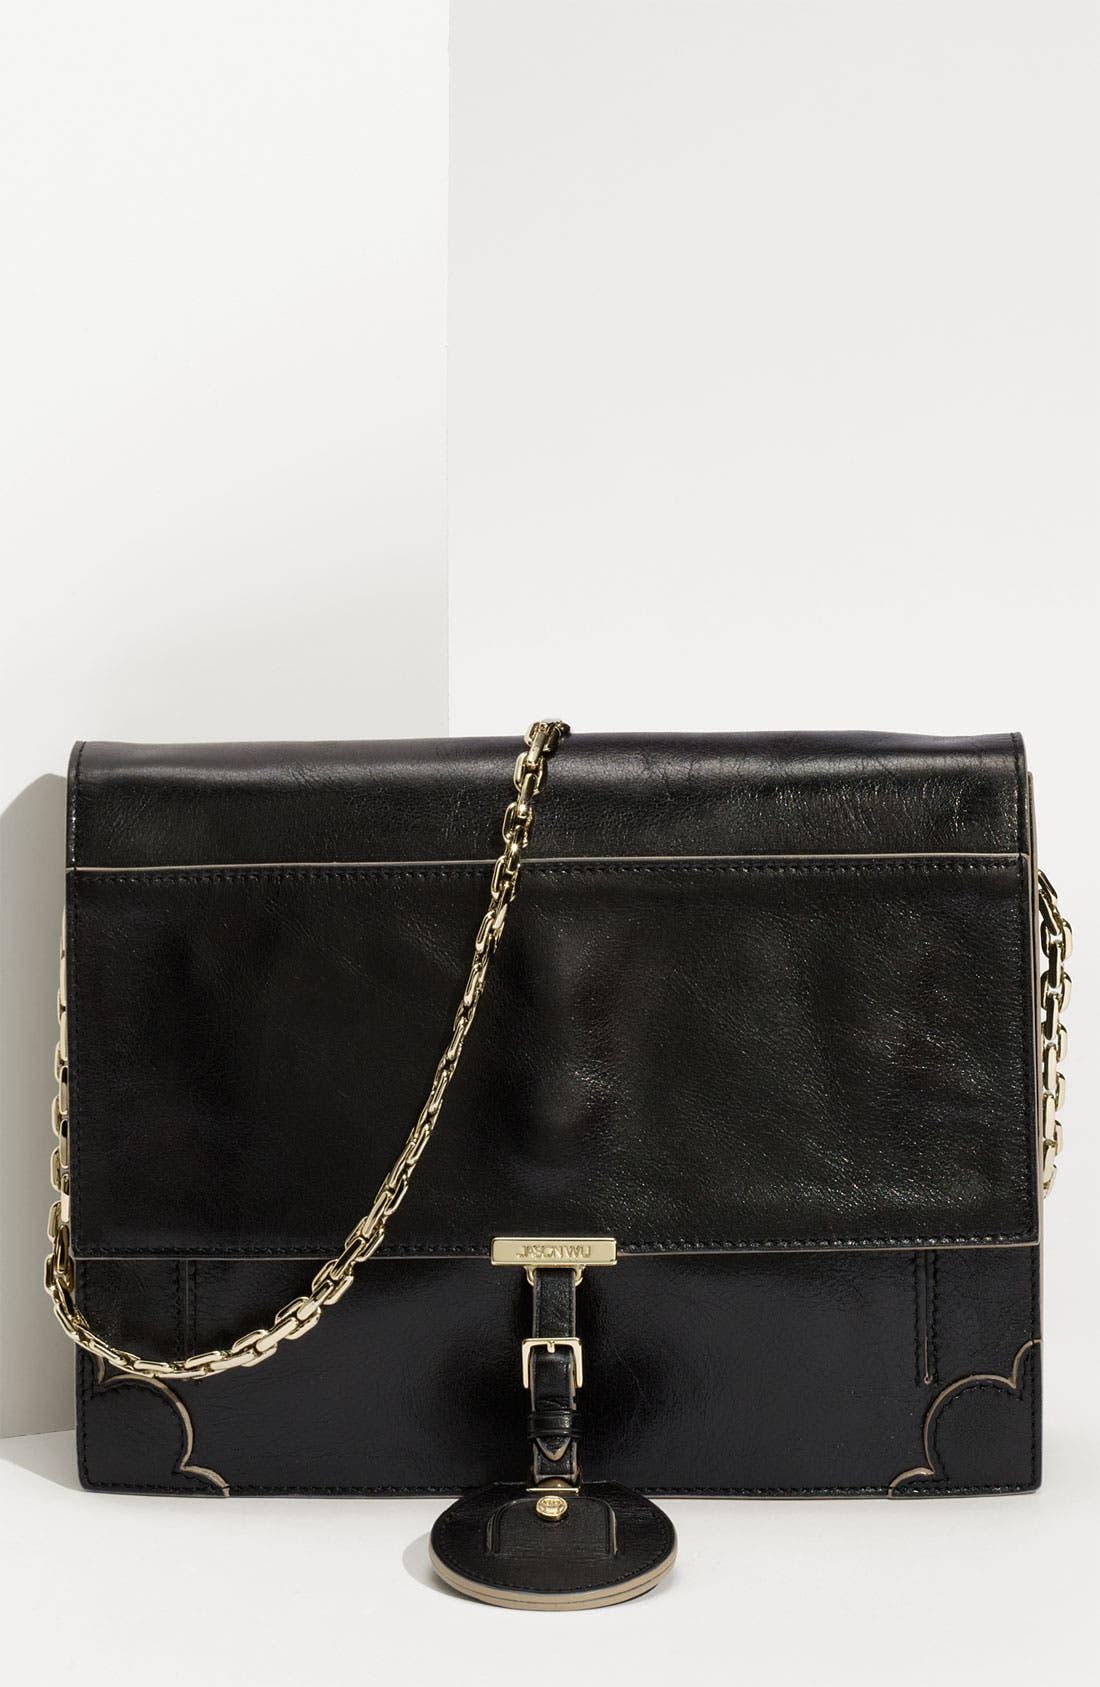 ,                             Jason Wu 'Jourdan' Calfskin Leather Shoulder Bag,                             Main thumbnail 1, color,                             001